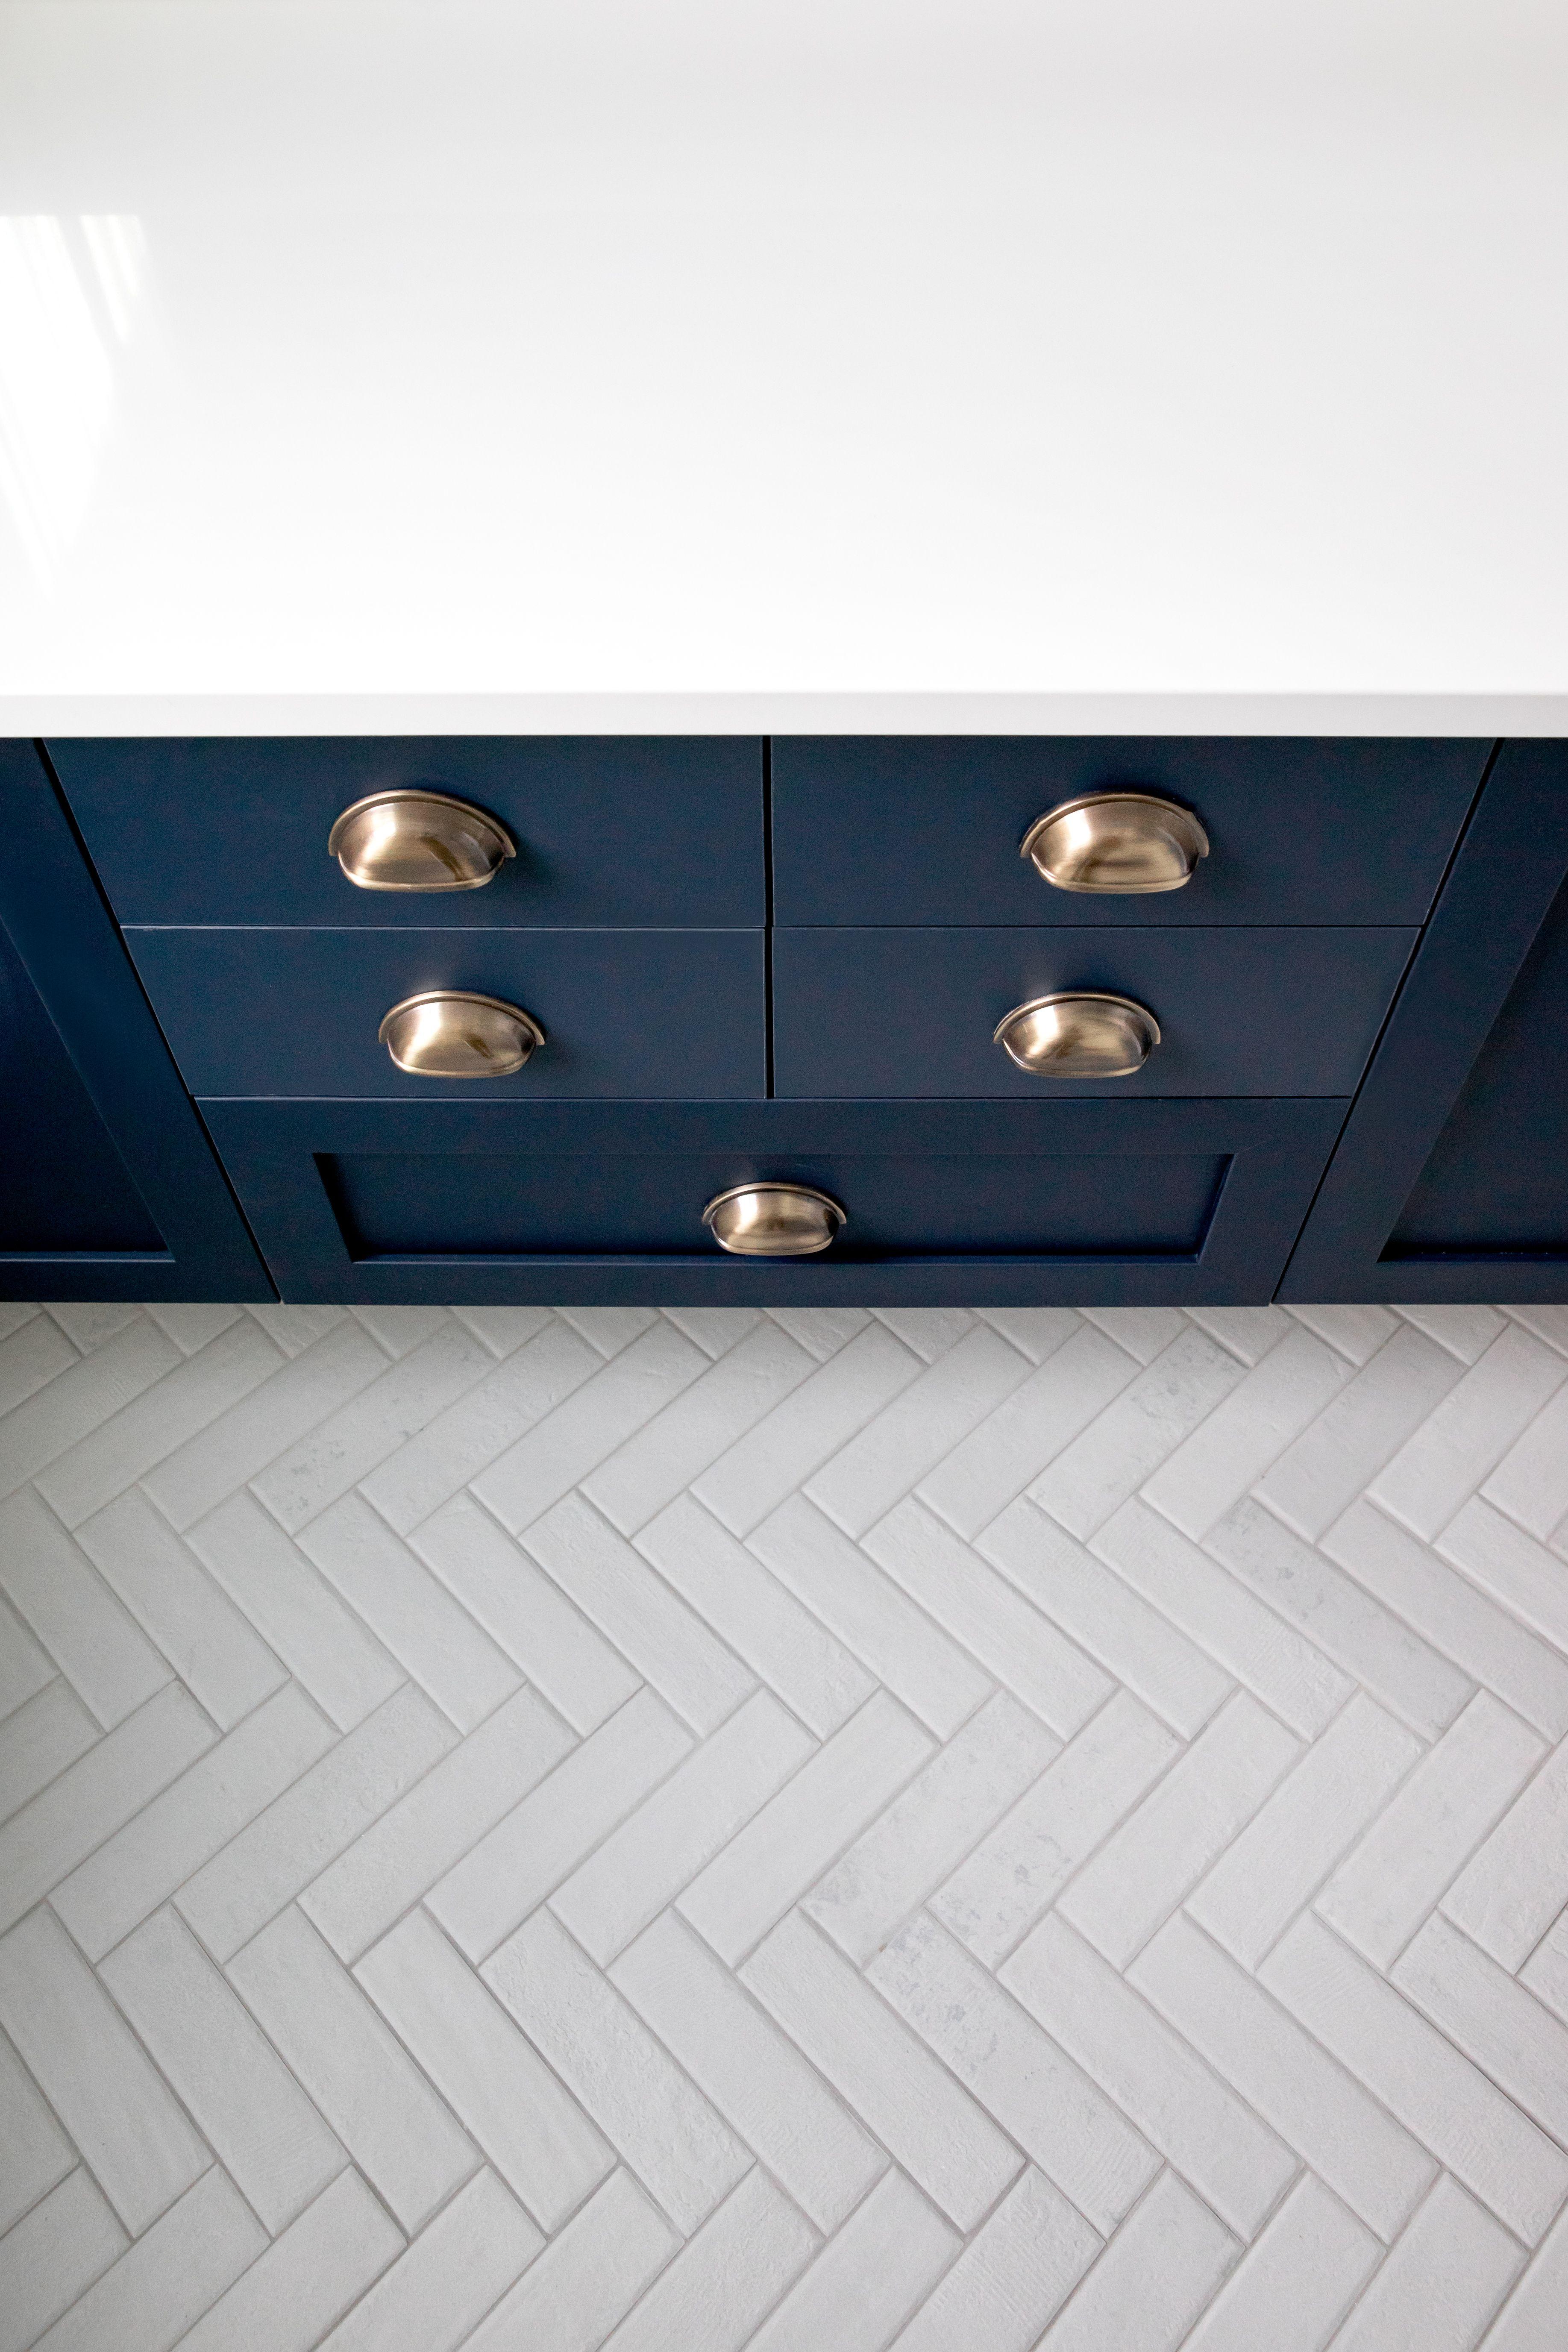 White Herringbone Bathroom Tile in 2020 Herringbone tile